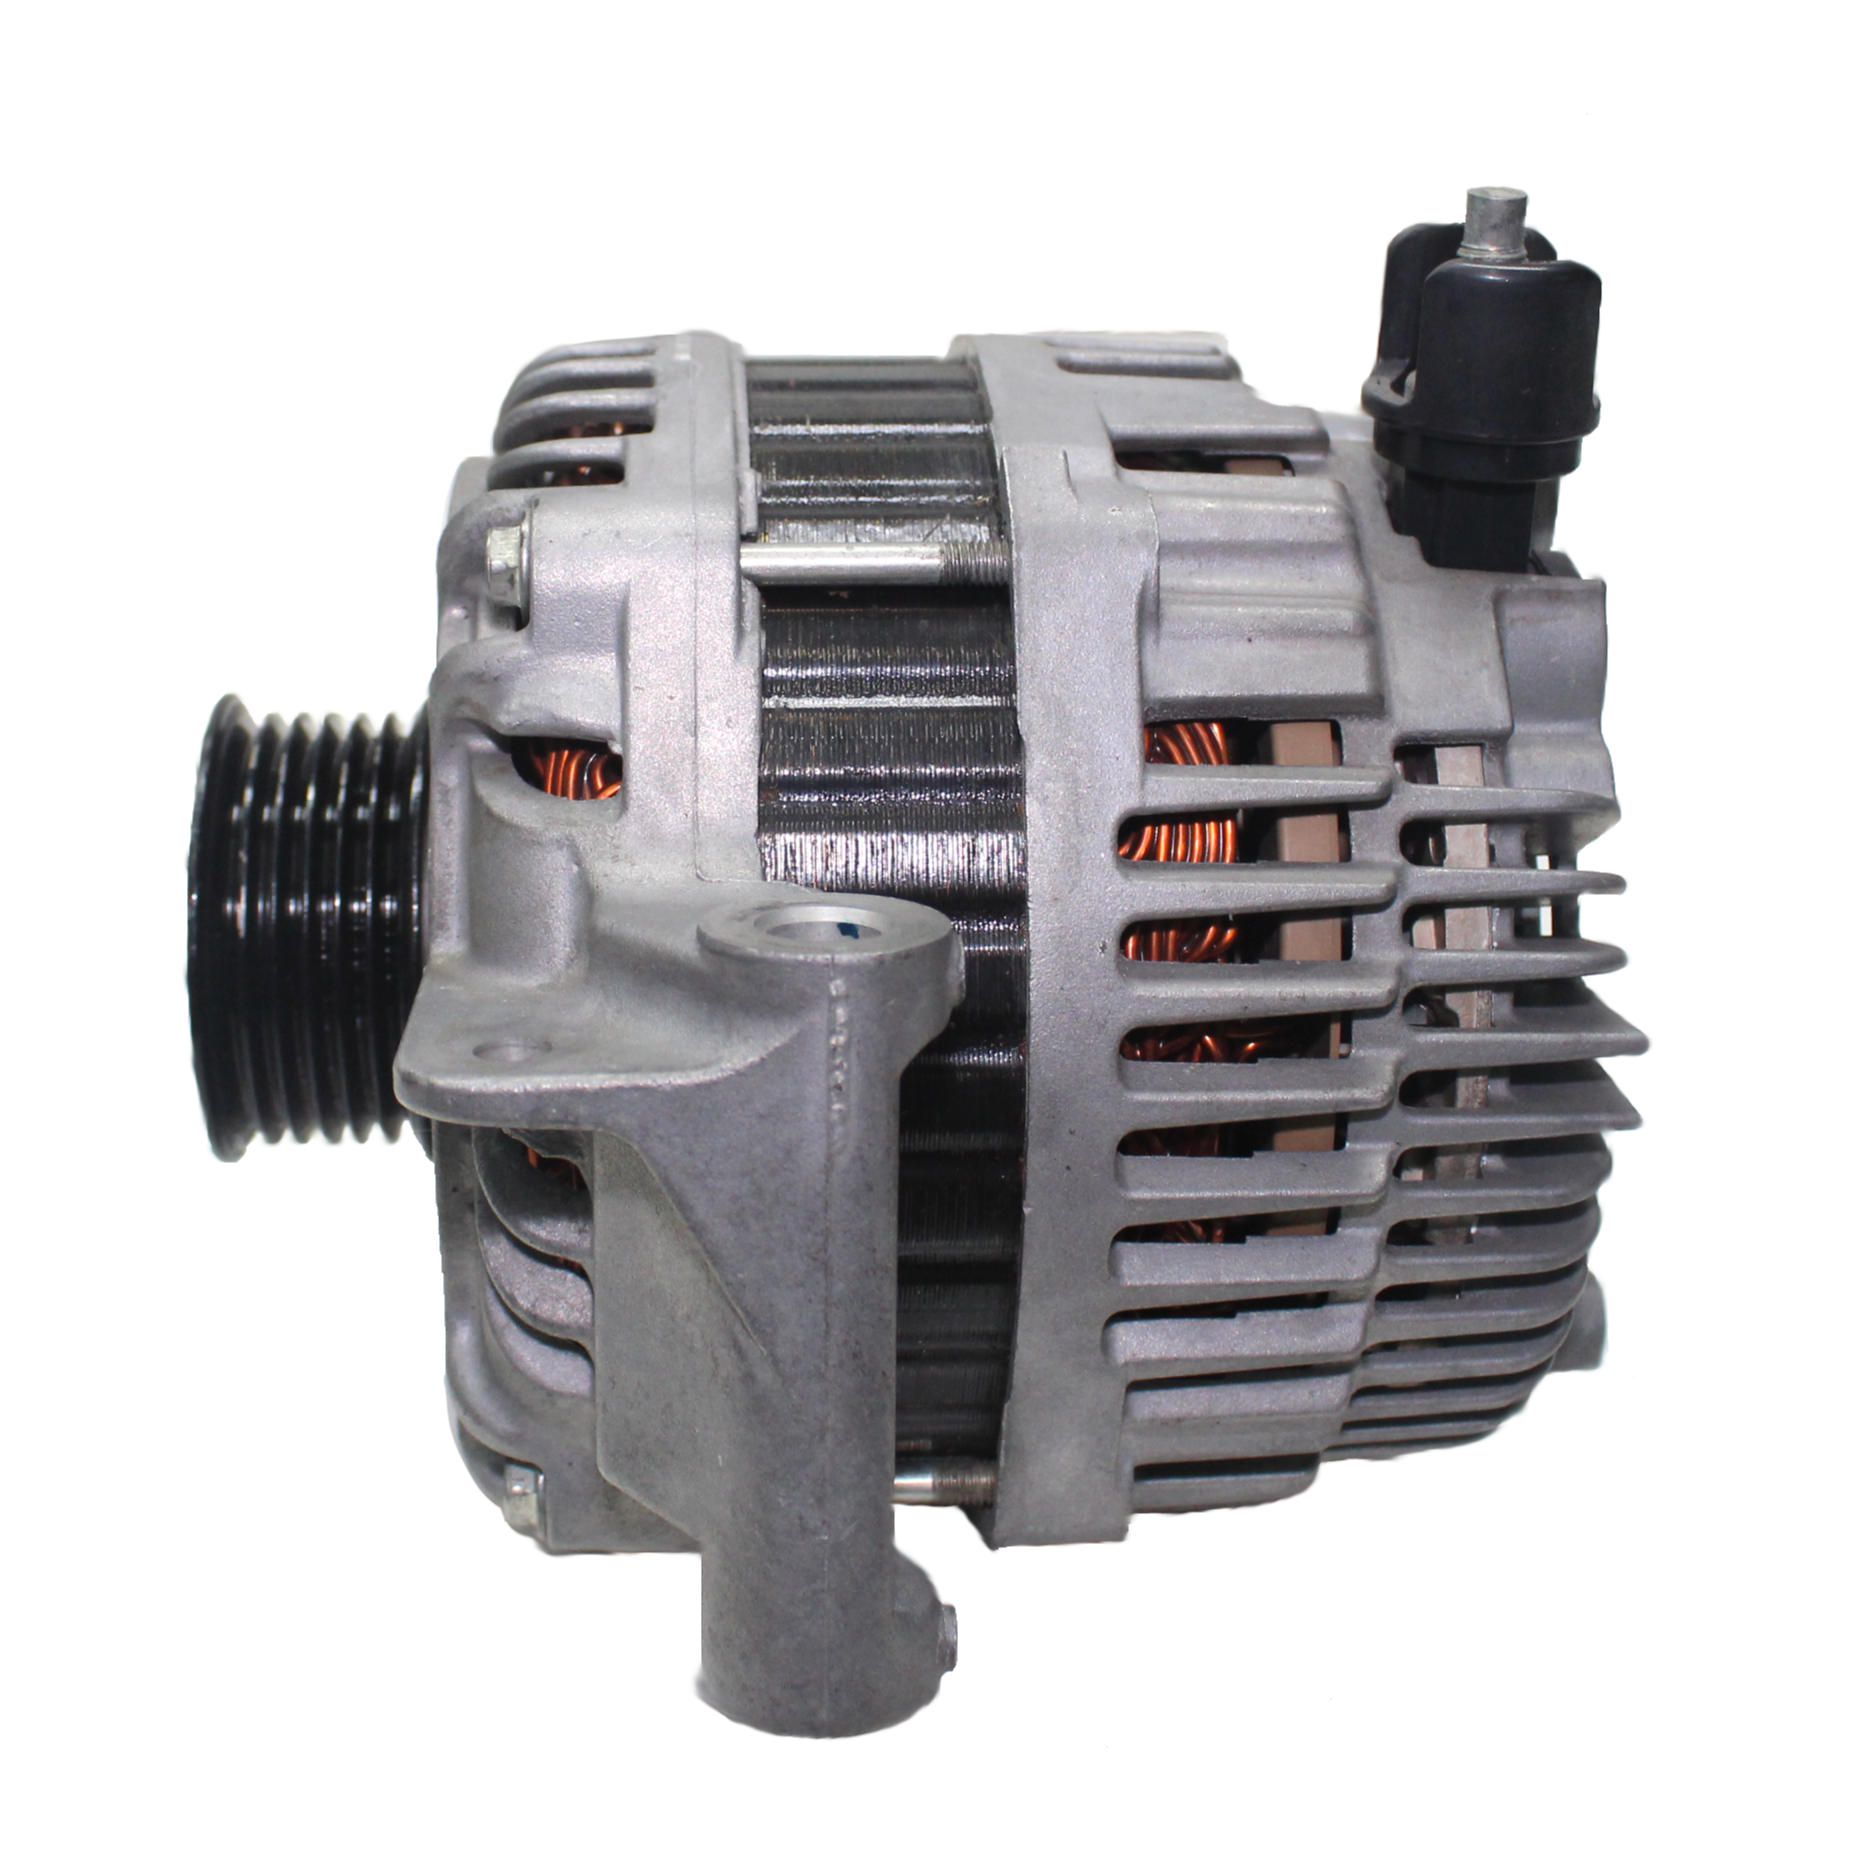 Alternador Recondicionado 150AH Ford Fusion 2.3 06..09 7E5T10300AB